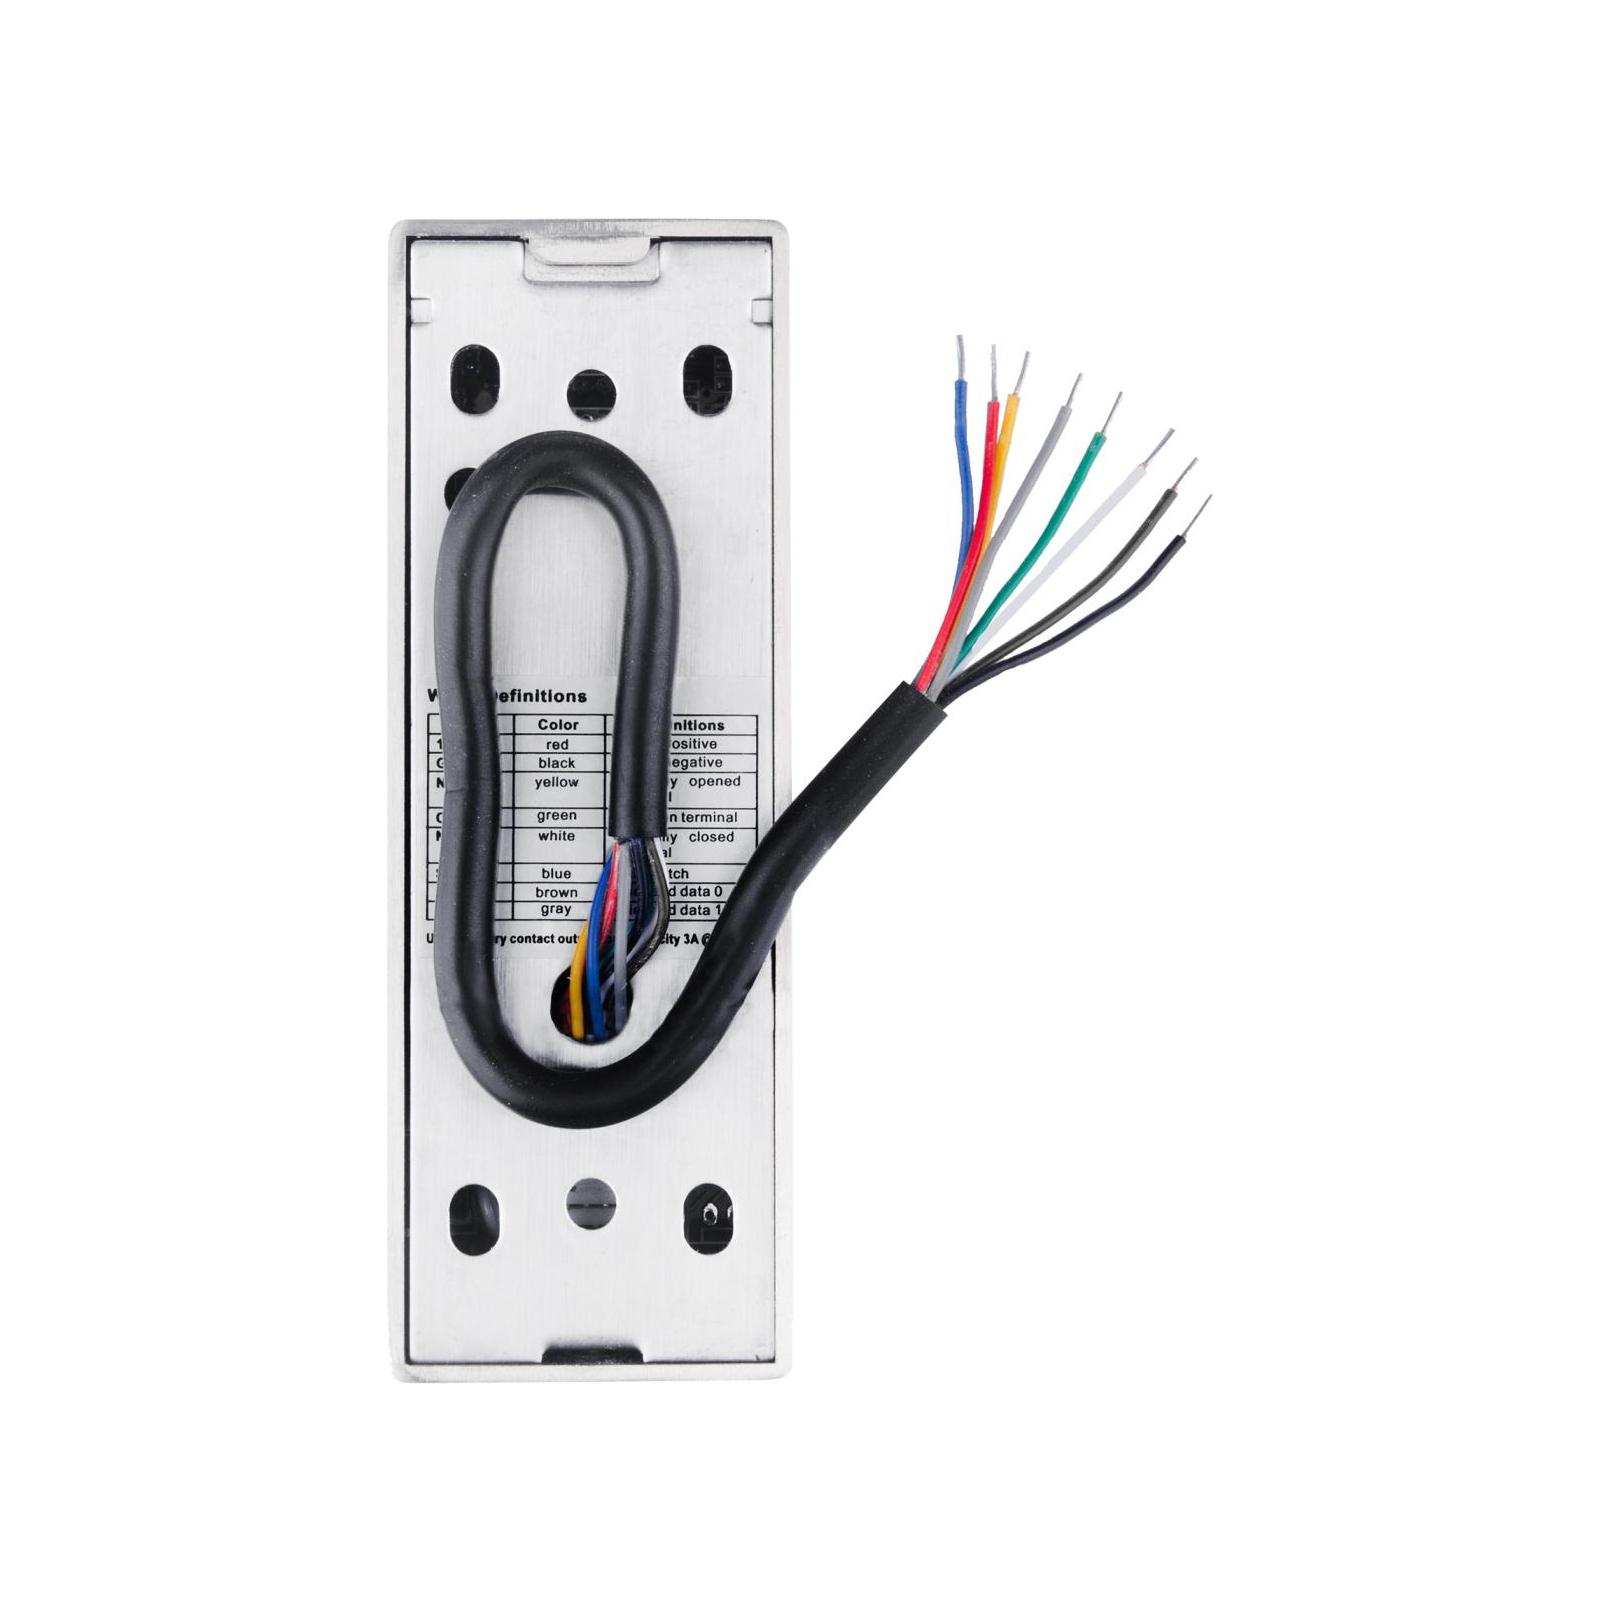 Контроллер доступа Greenvision GV-CEM-002-125 (4176) изображение 4